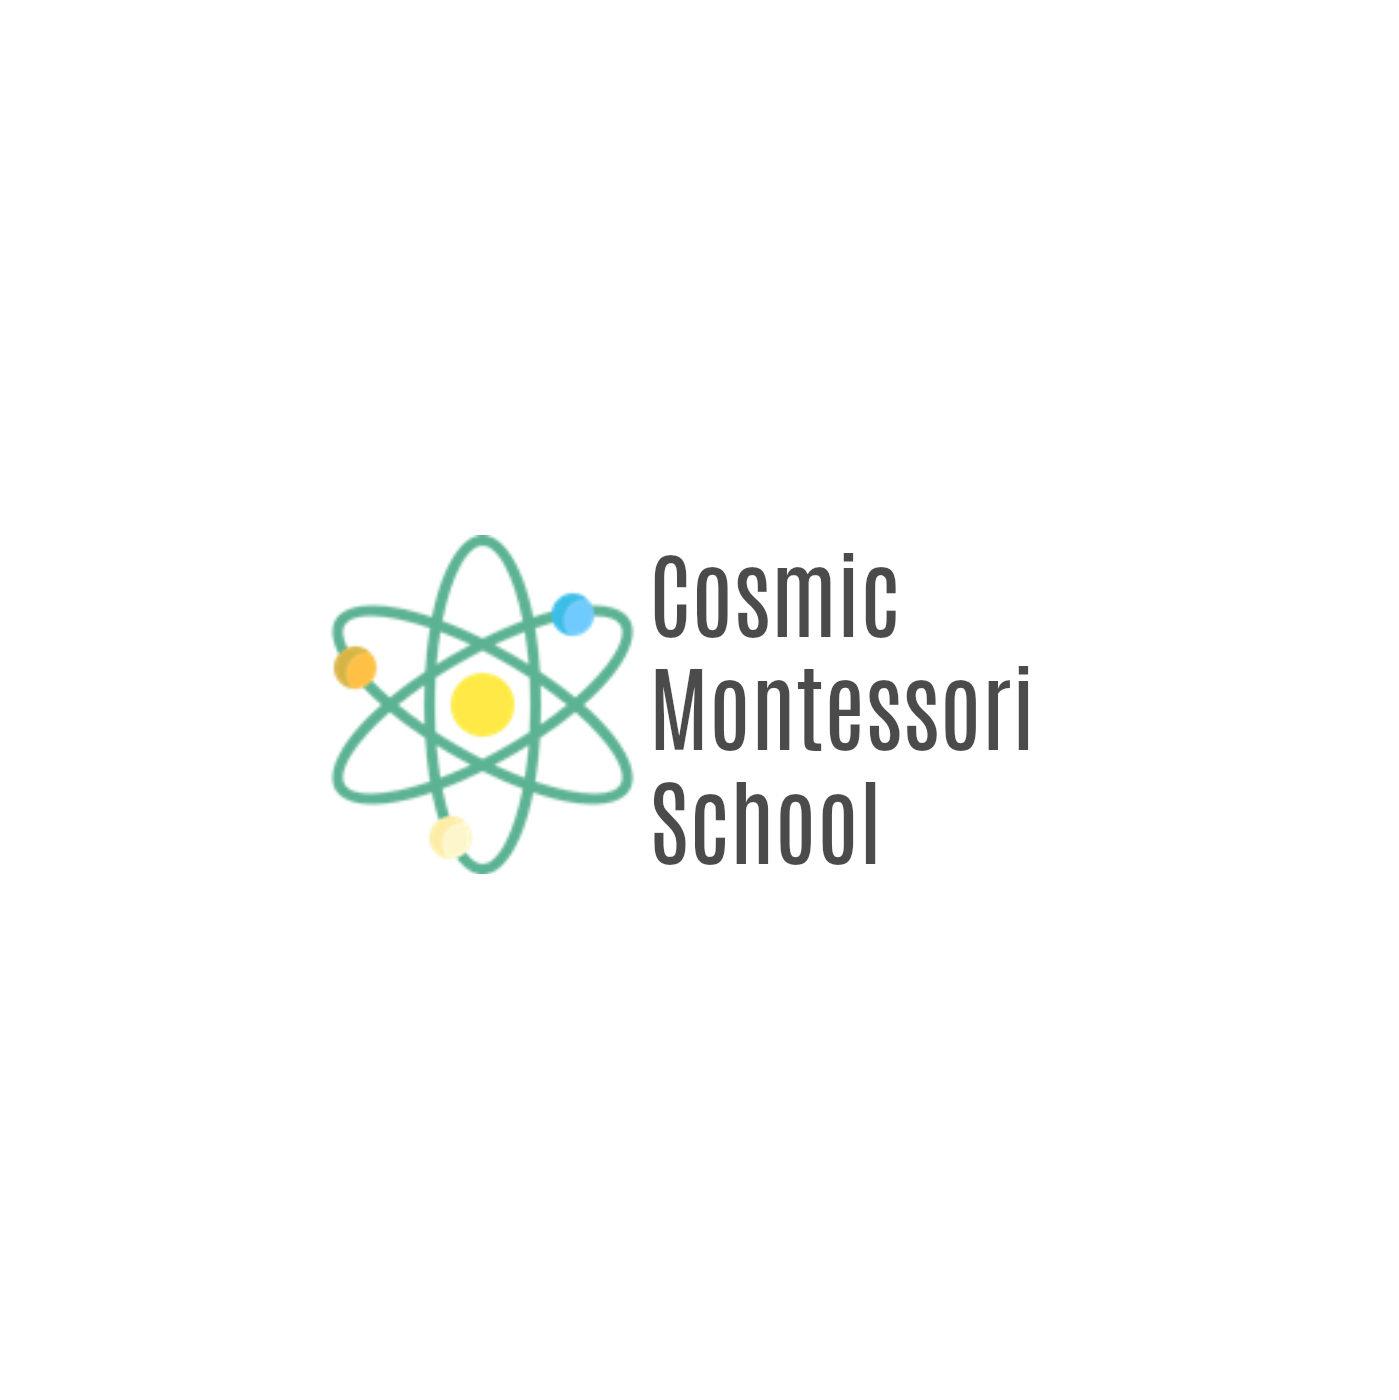 Cosmic Montessori